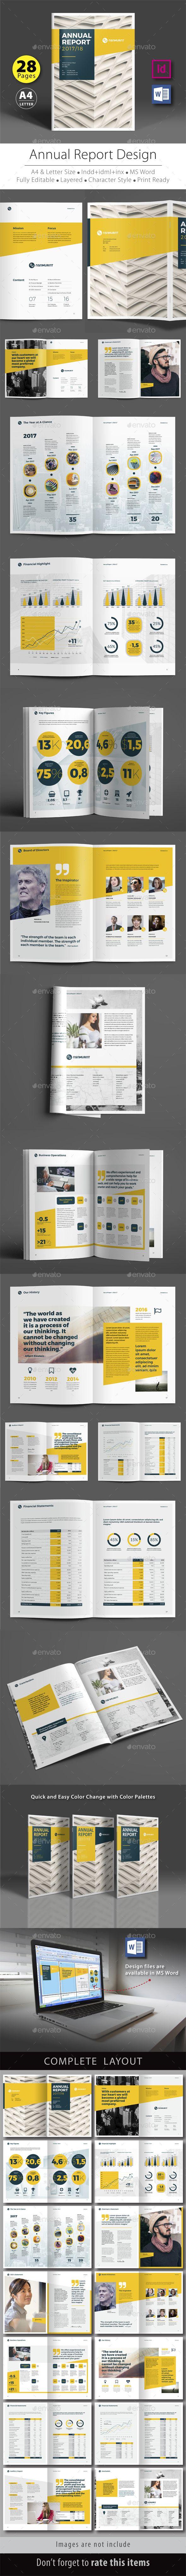 Annual Report Design Template V.7 - Corporate Brochures